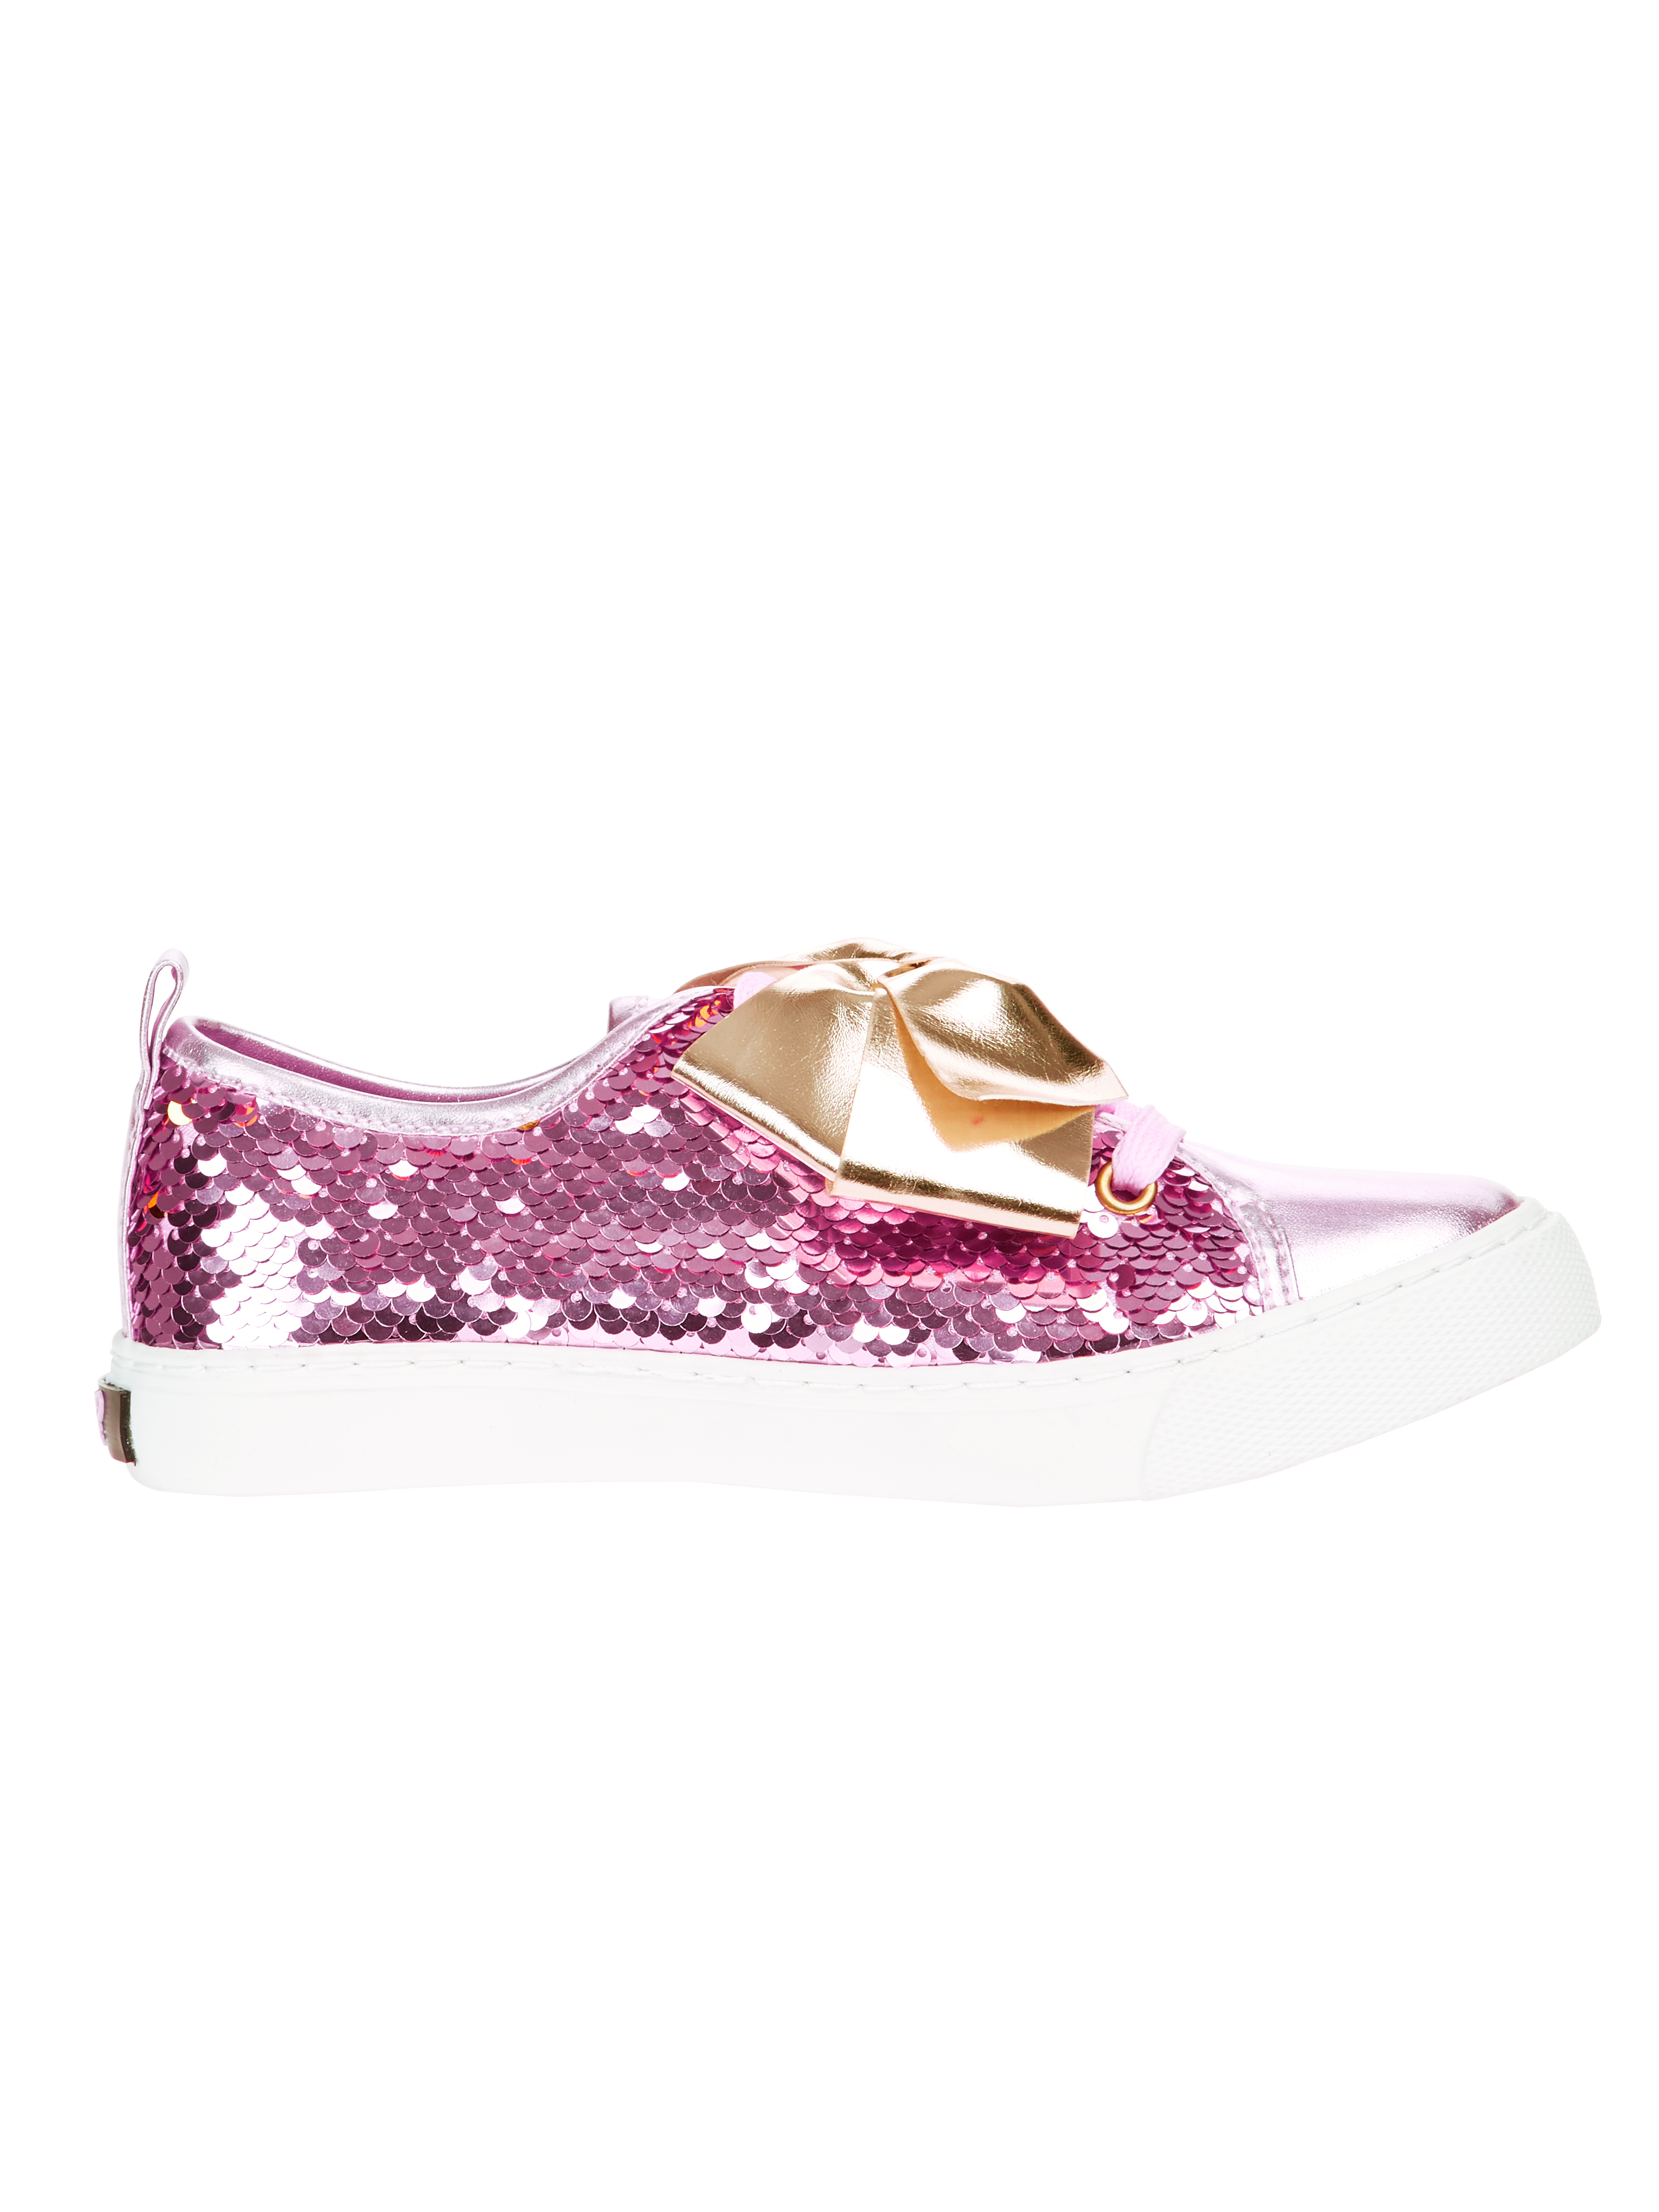 JoJo Siwa Girls Shoes New Arrivals